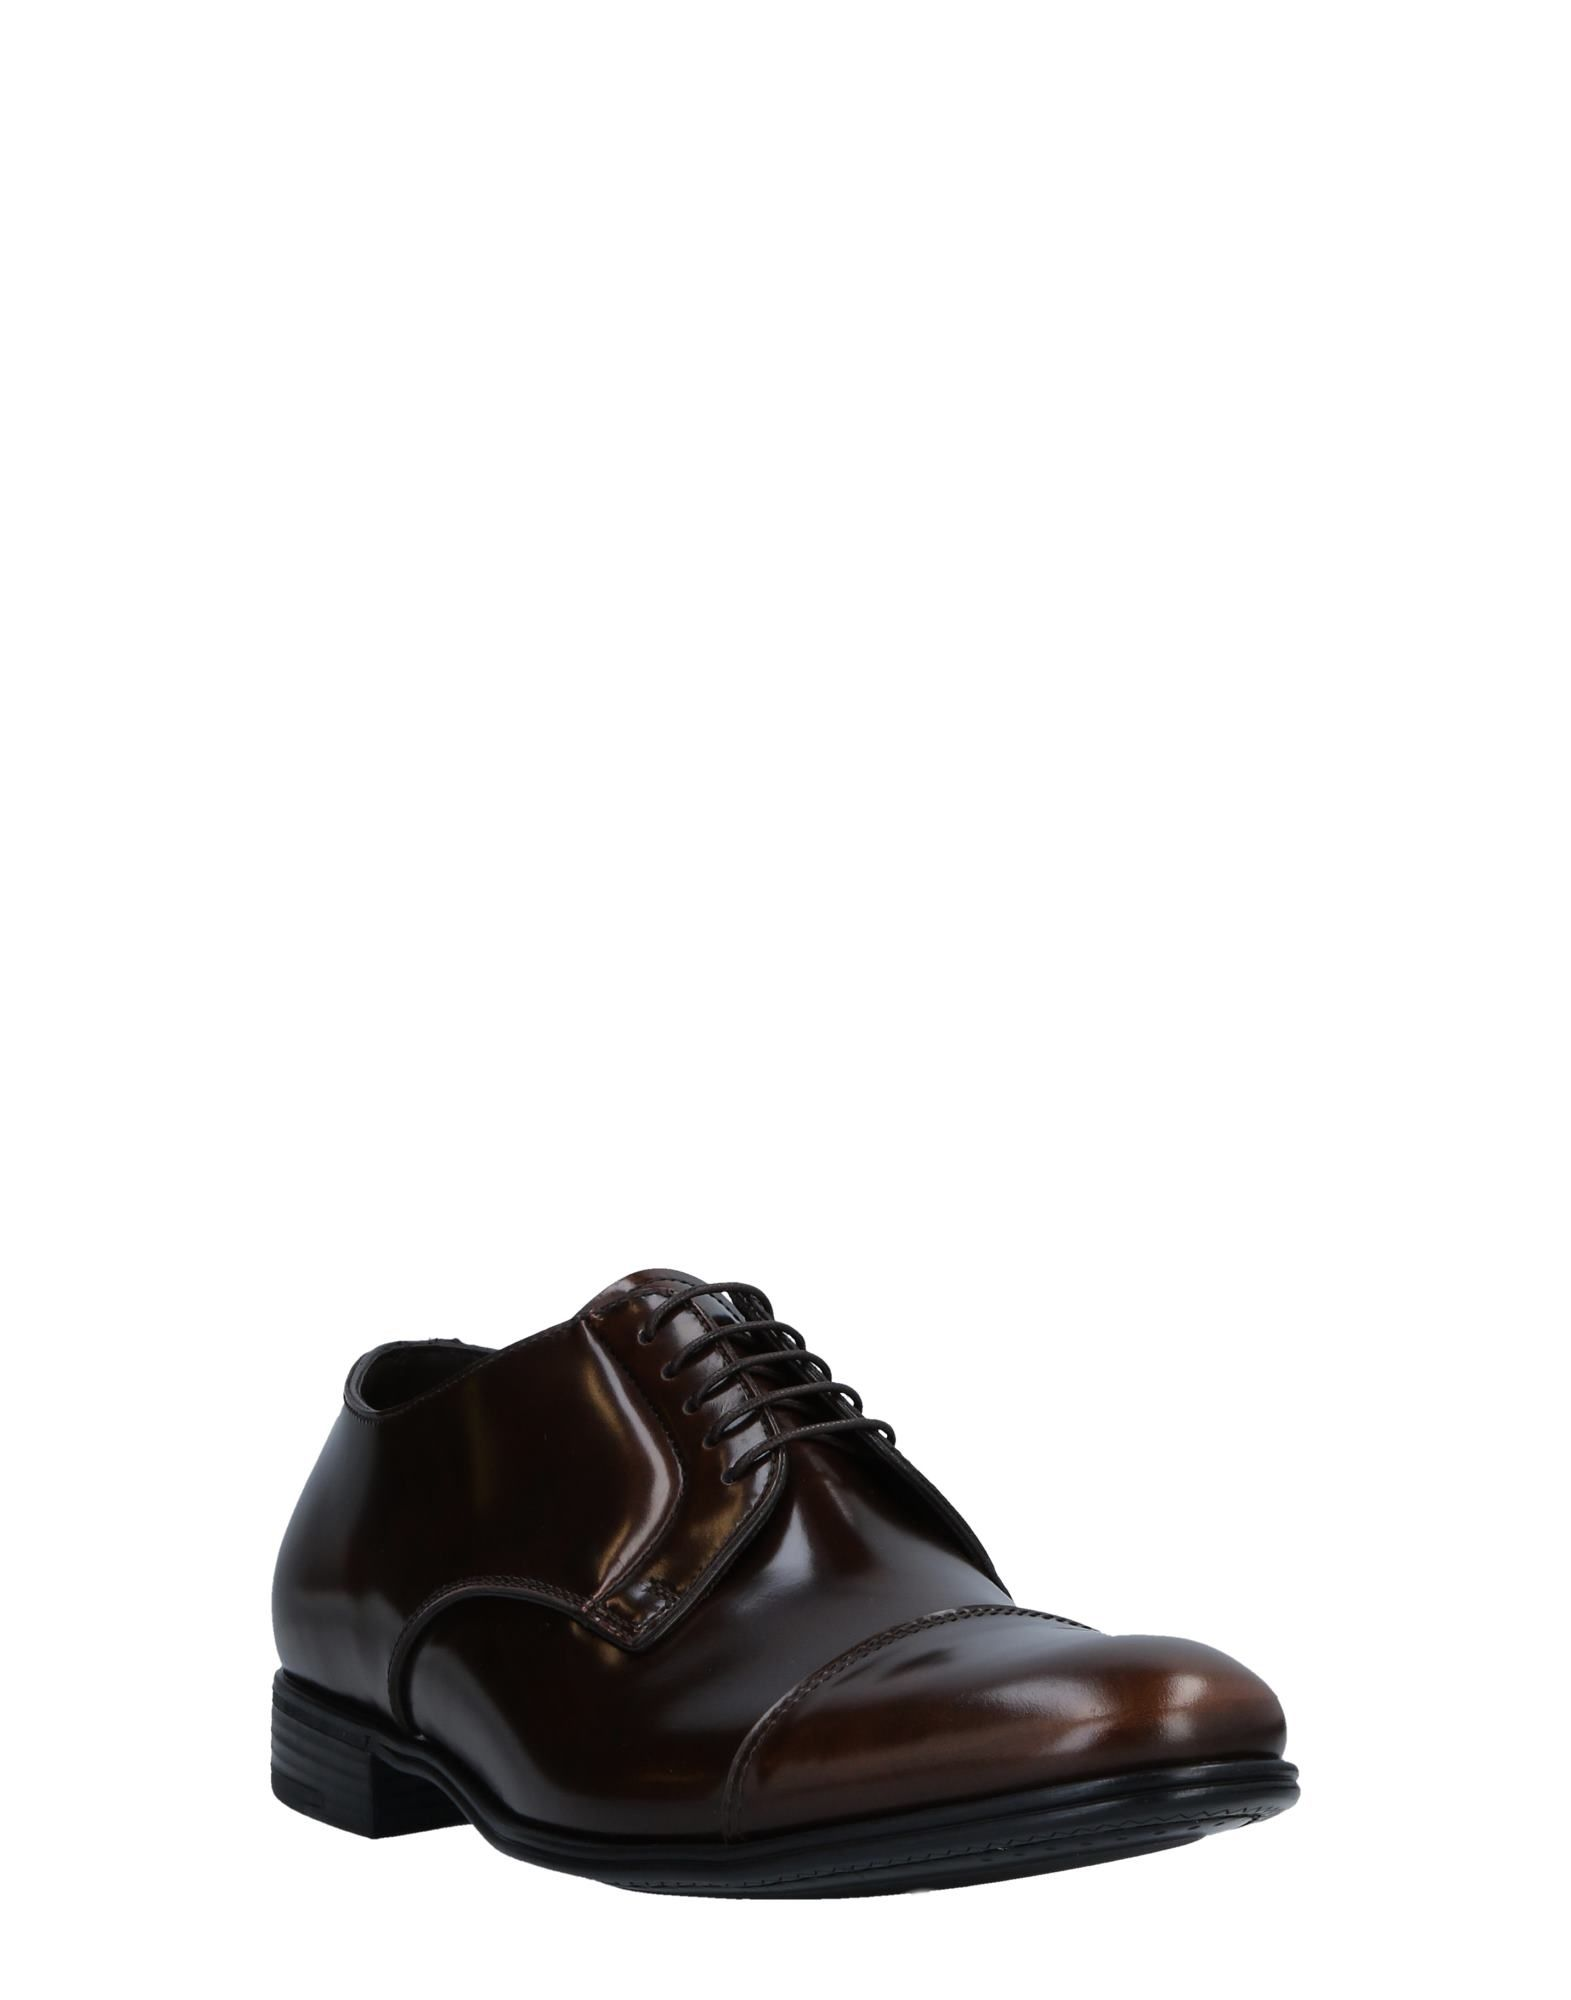 Fabi Schnürschuhe Herren  11517820QS Gute Qualität beliebte Schuhe